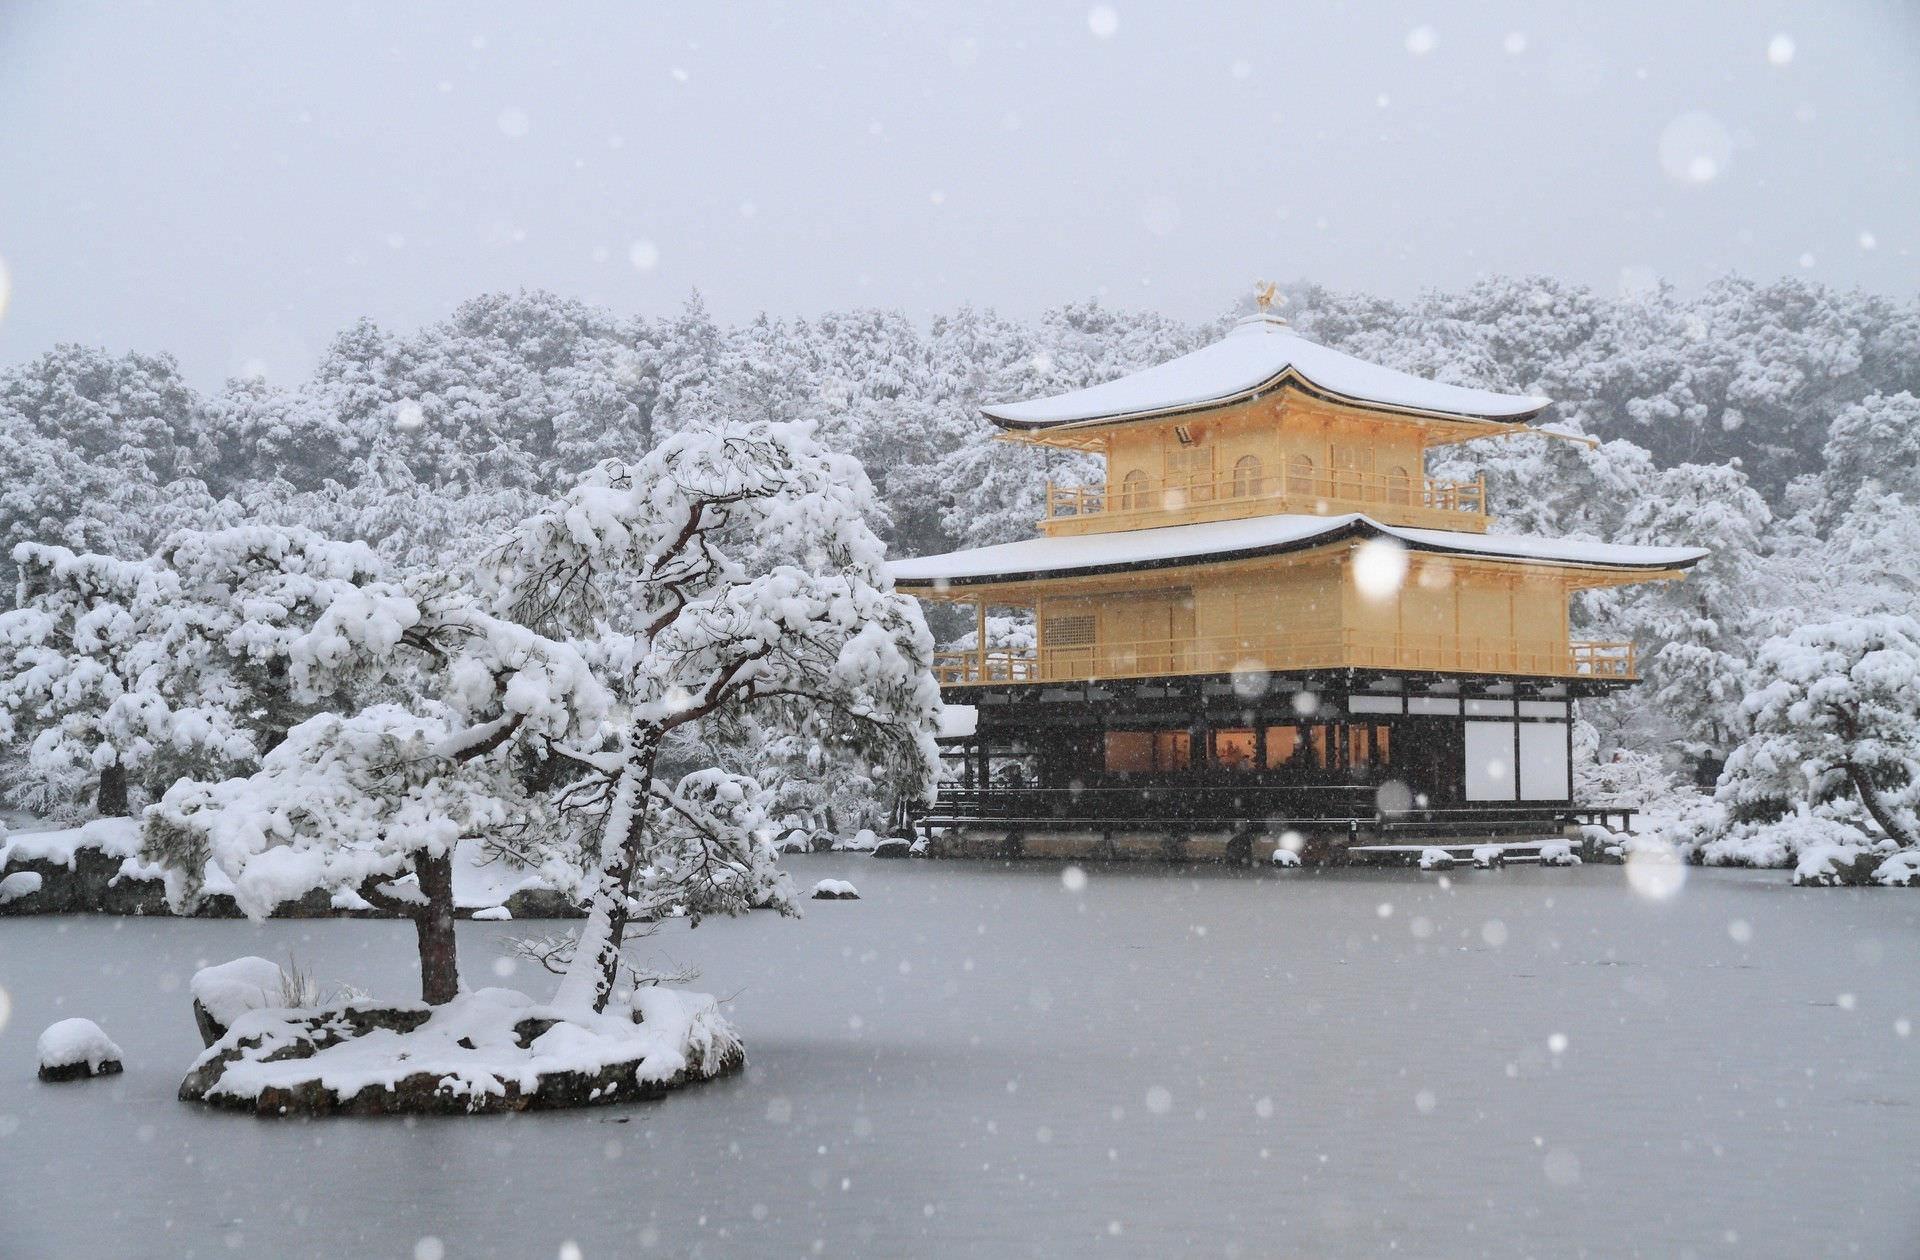 Temple In Snow Wallpaper